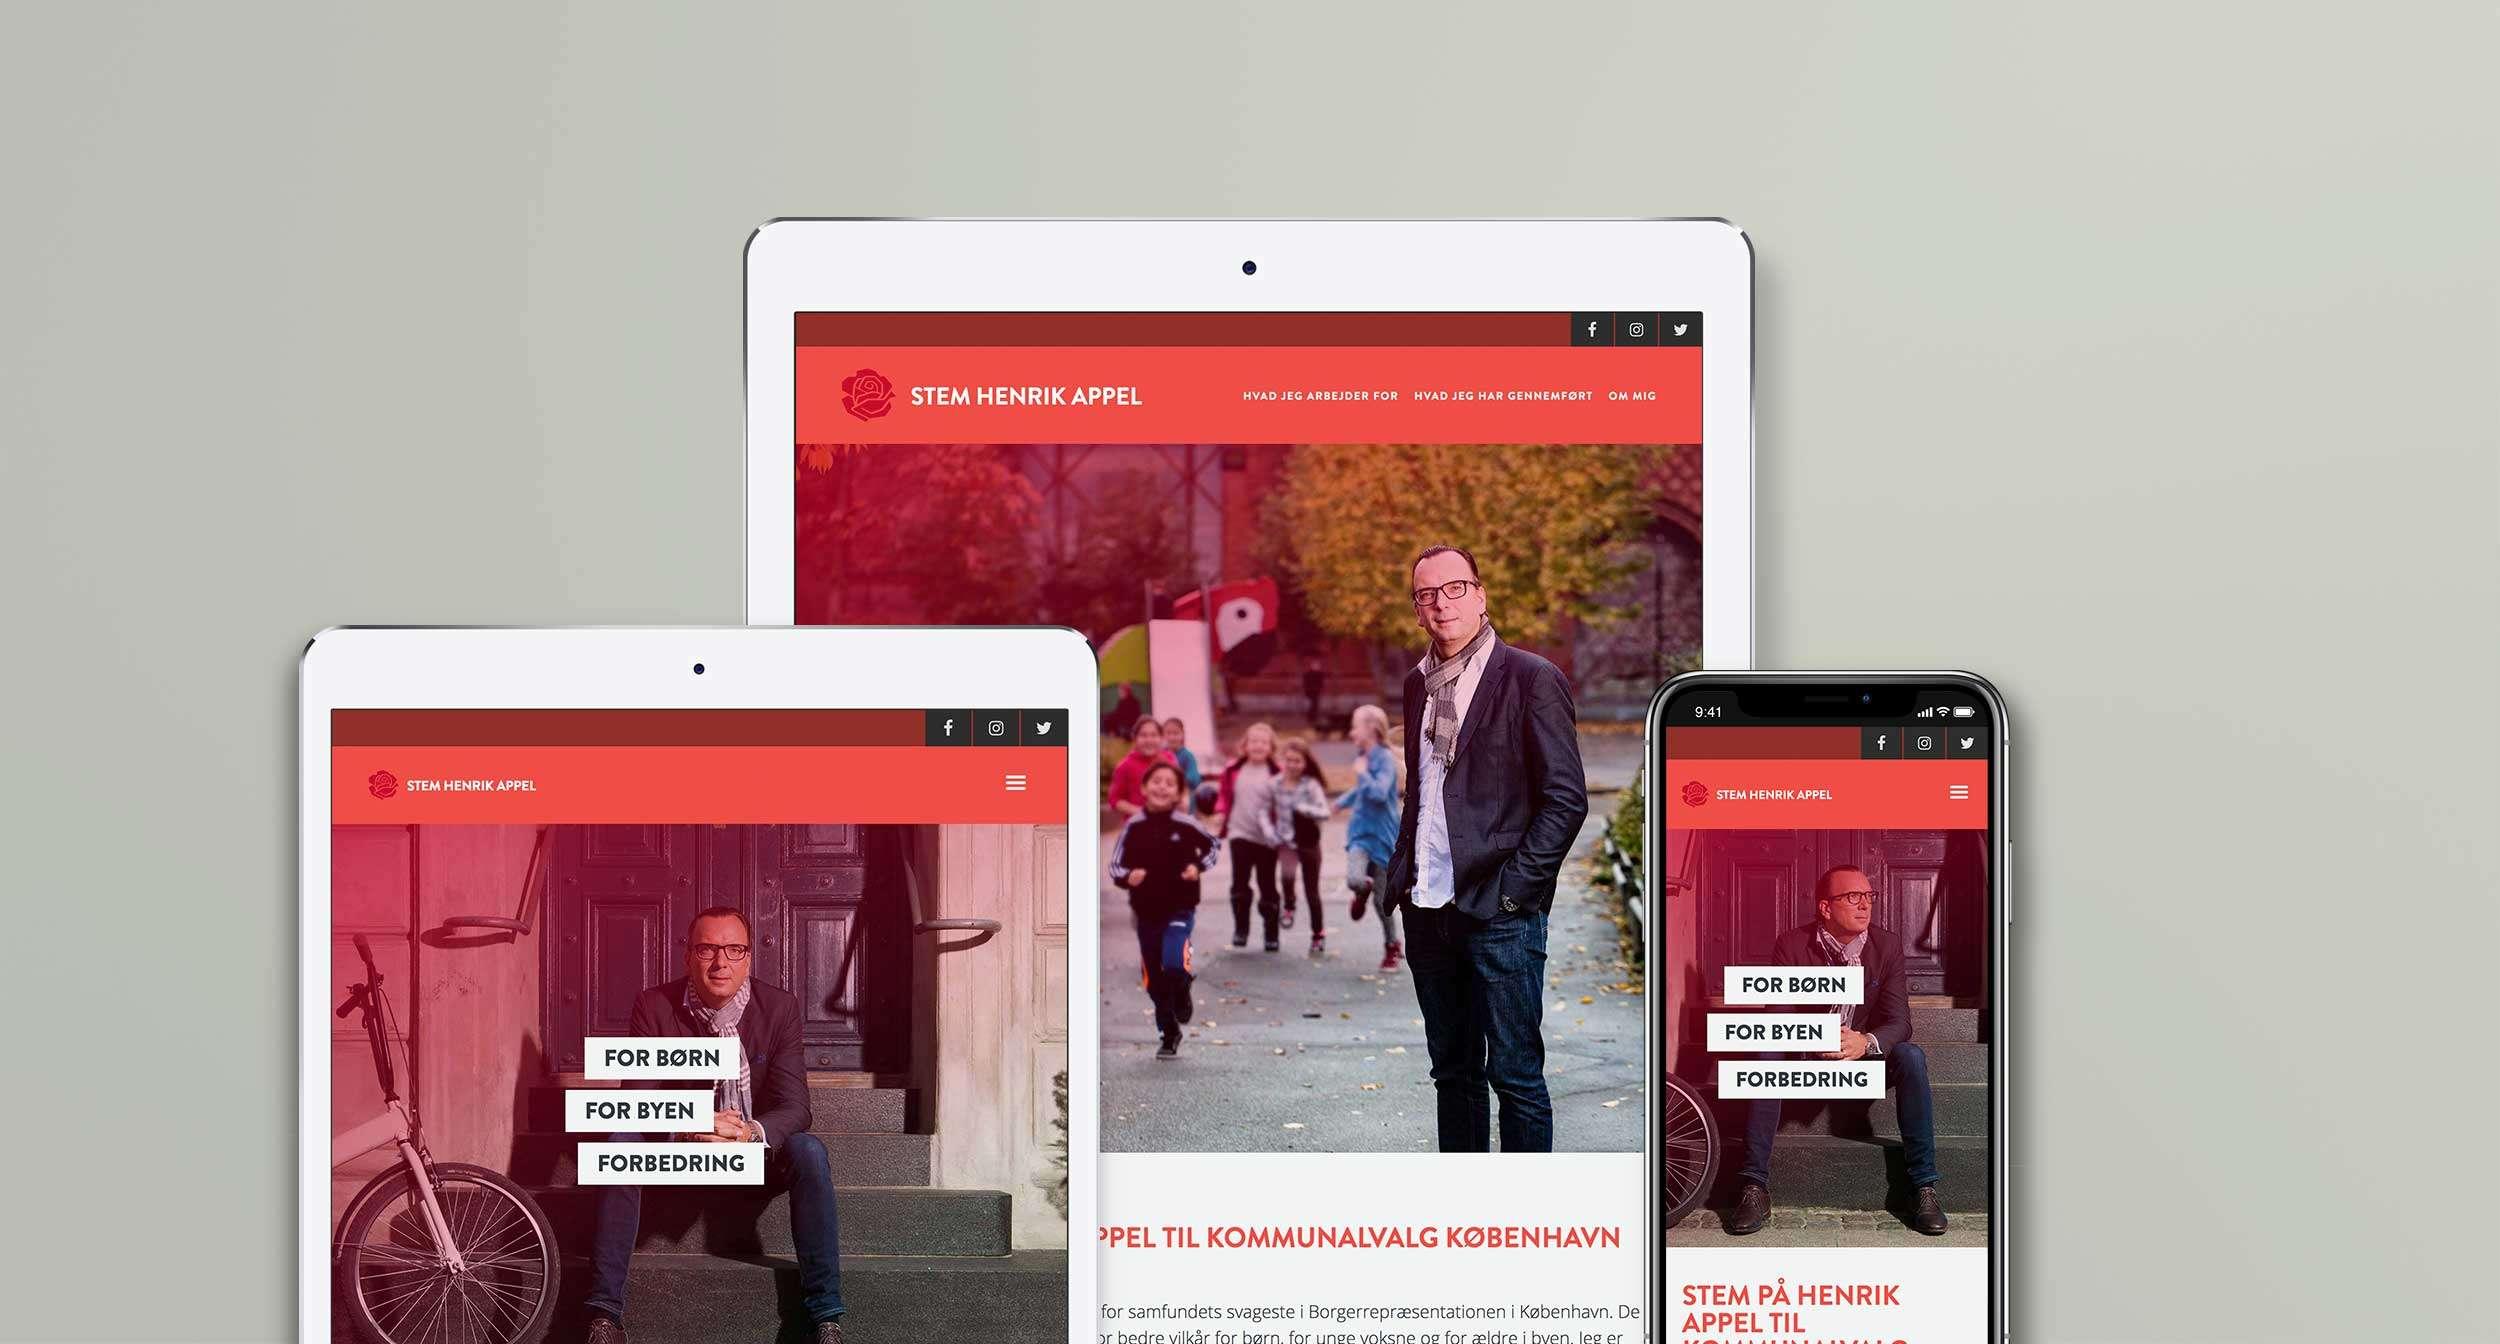 Stem Henrik Appel website on iPad Pro, Ipad and iPhone